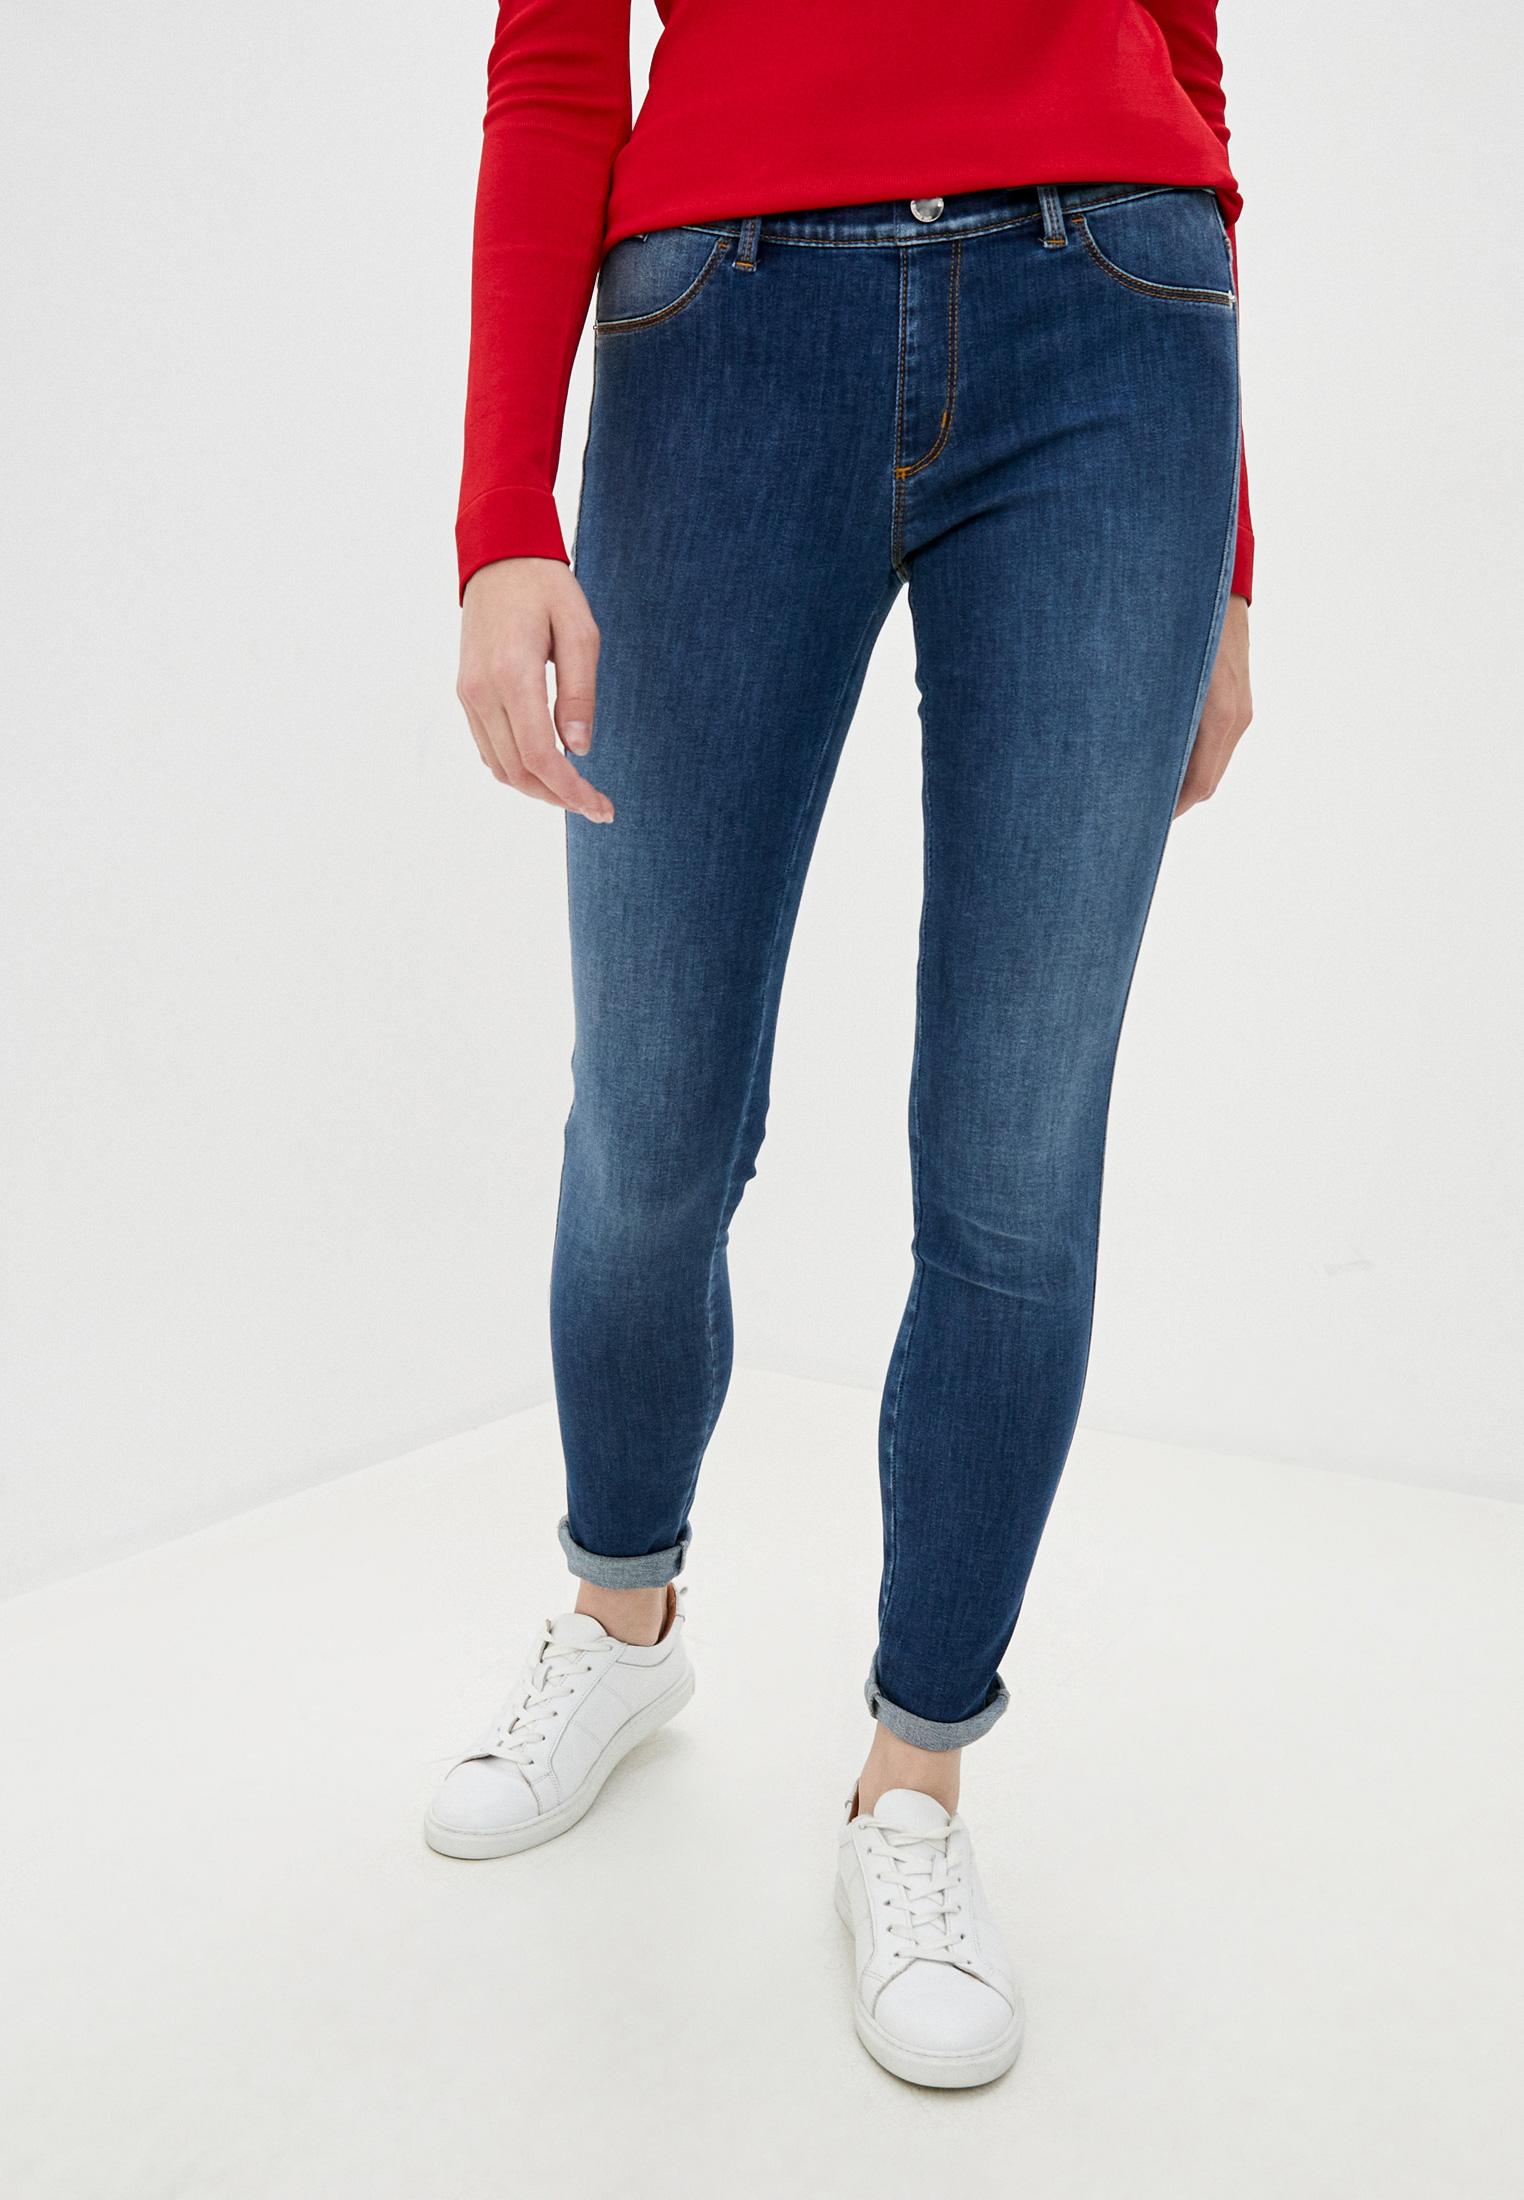 Зауженные джинсы Love Moschino W Q 407 14 S 3447